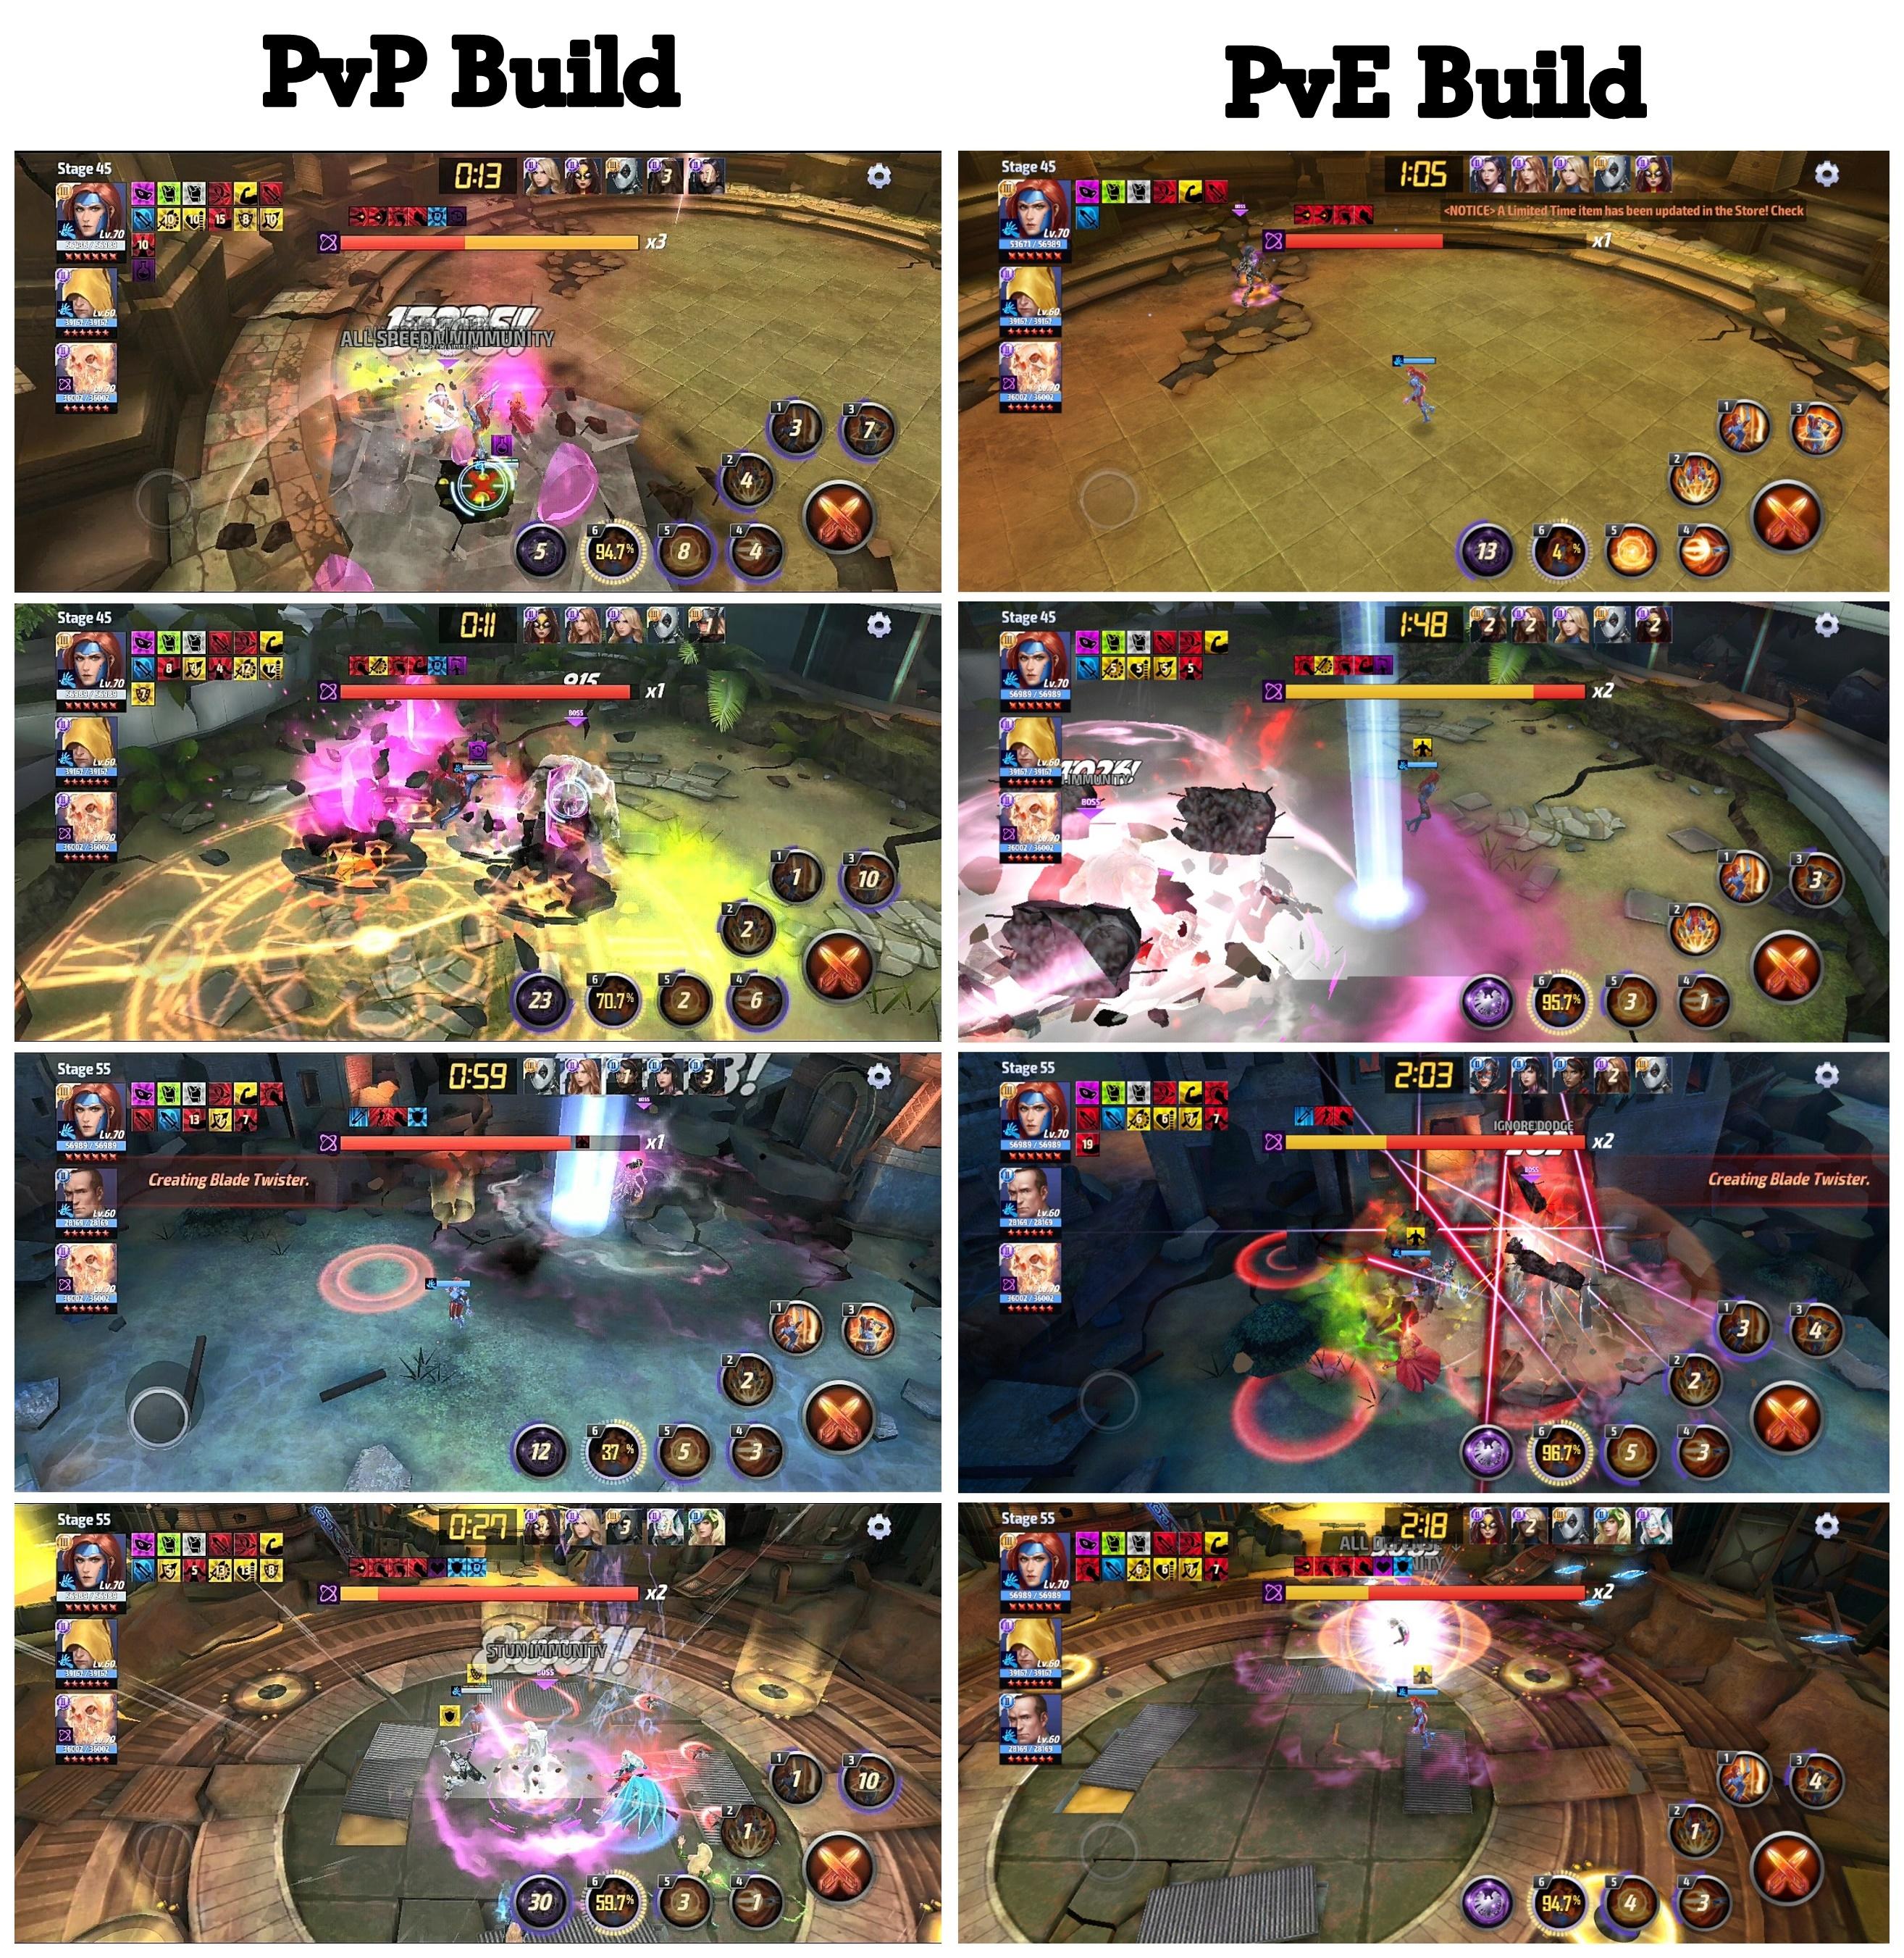 Jean Grey T3 WBU Tes (PvP & PvE Build) : future_fight